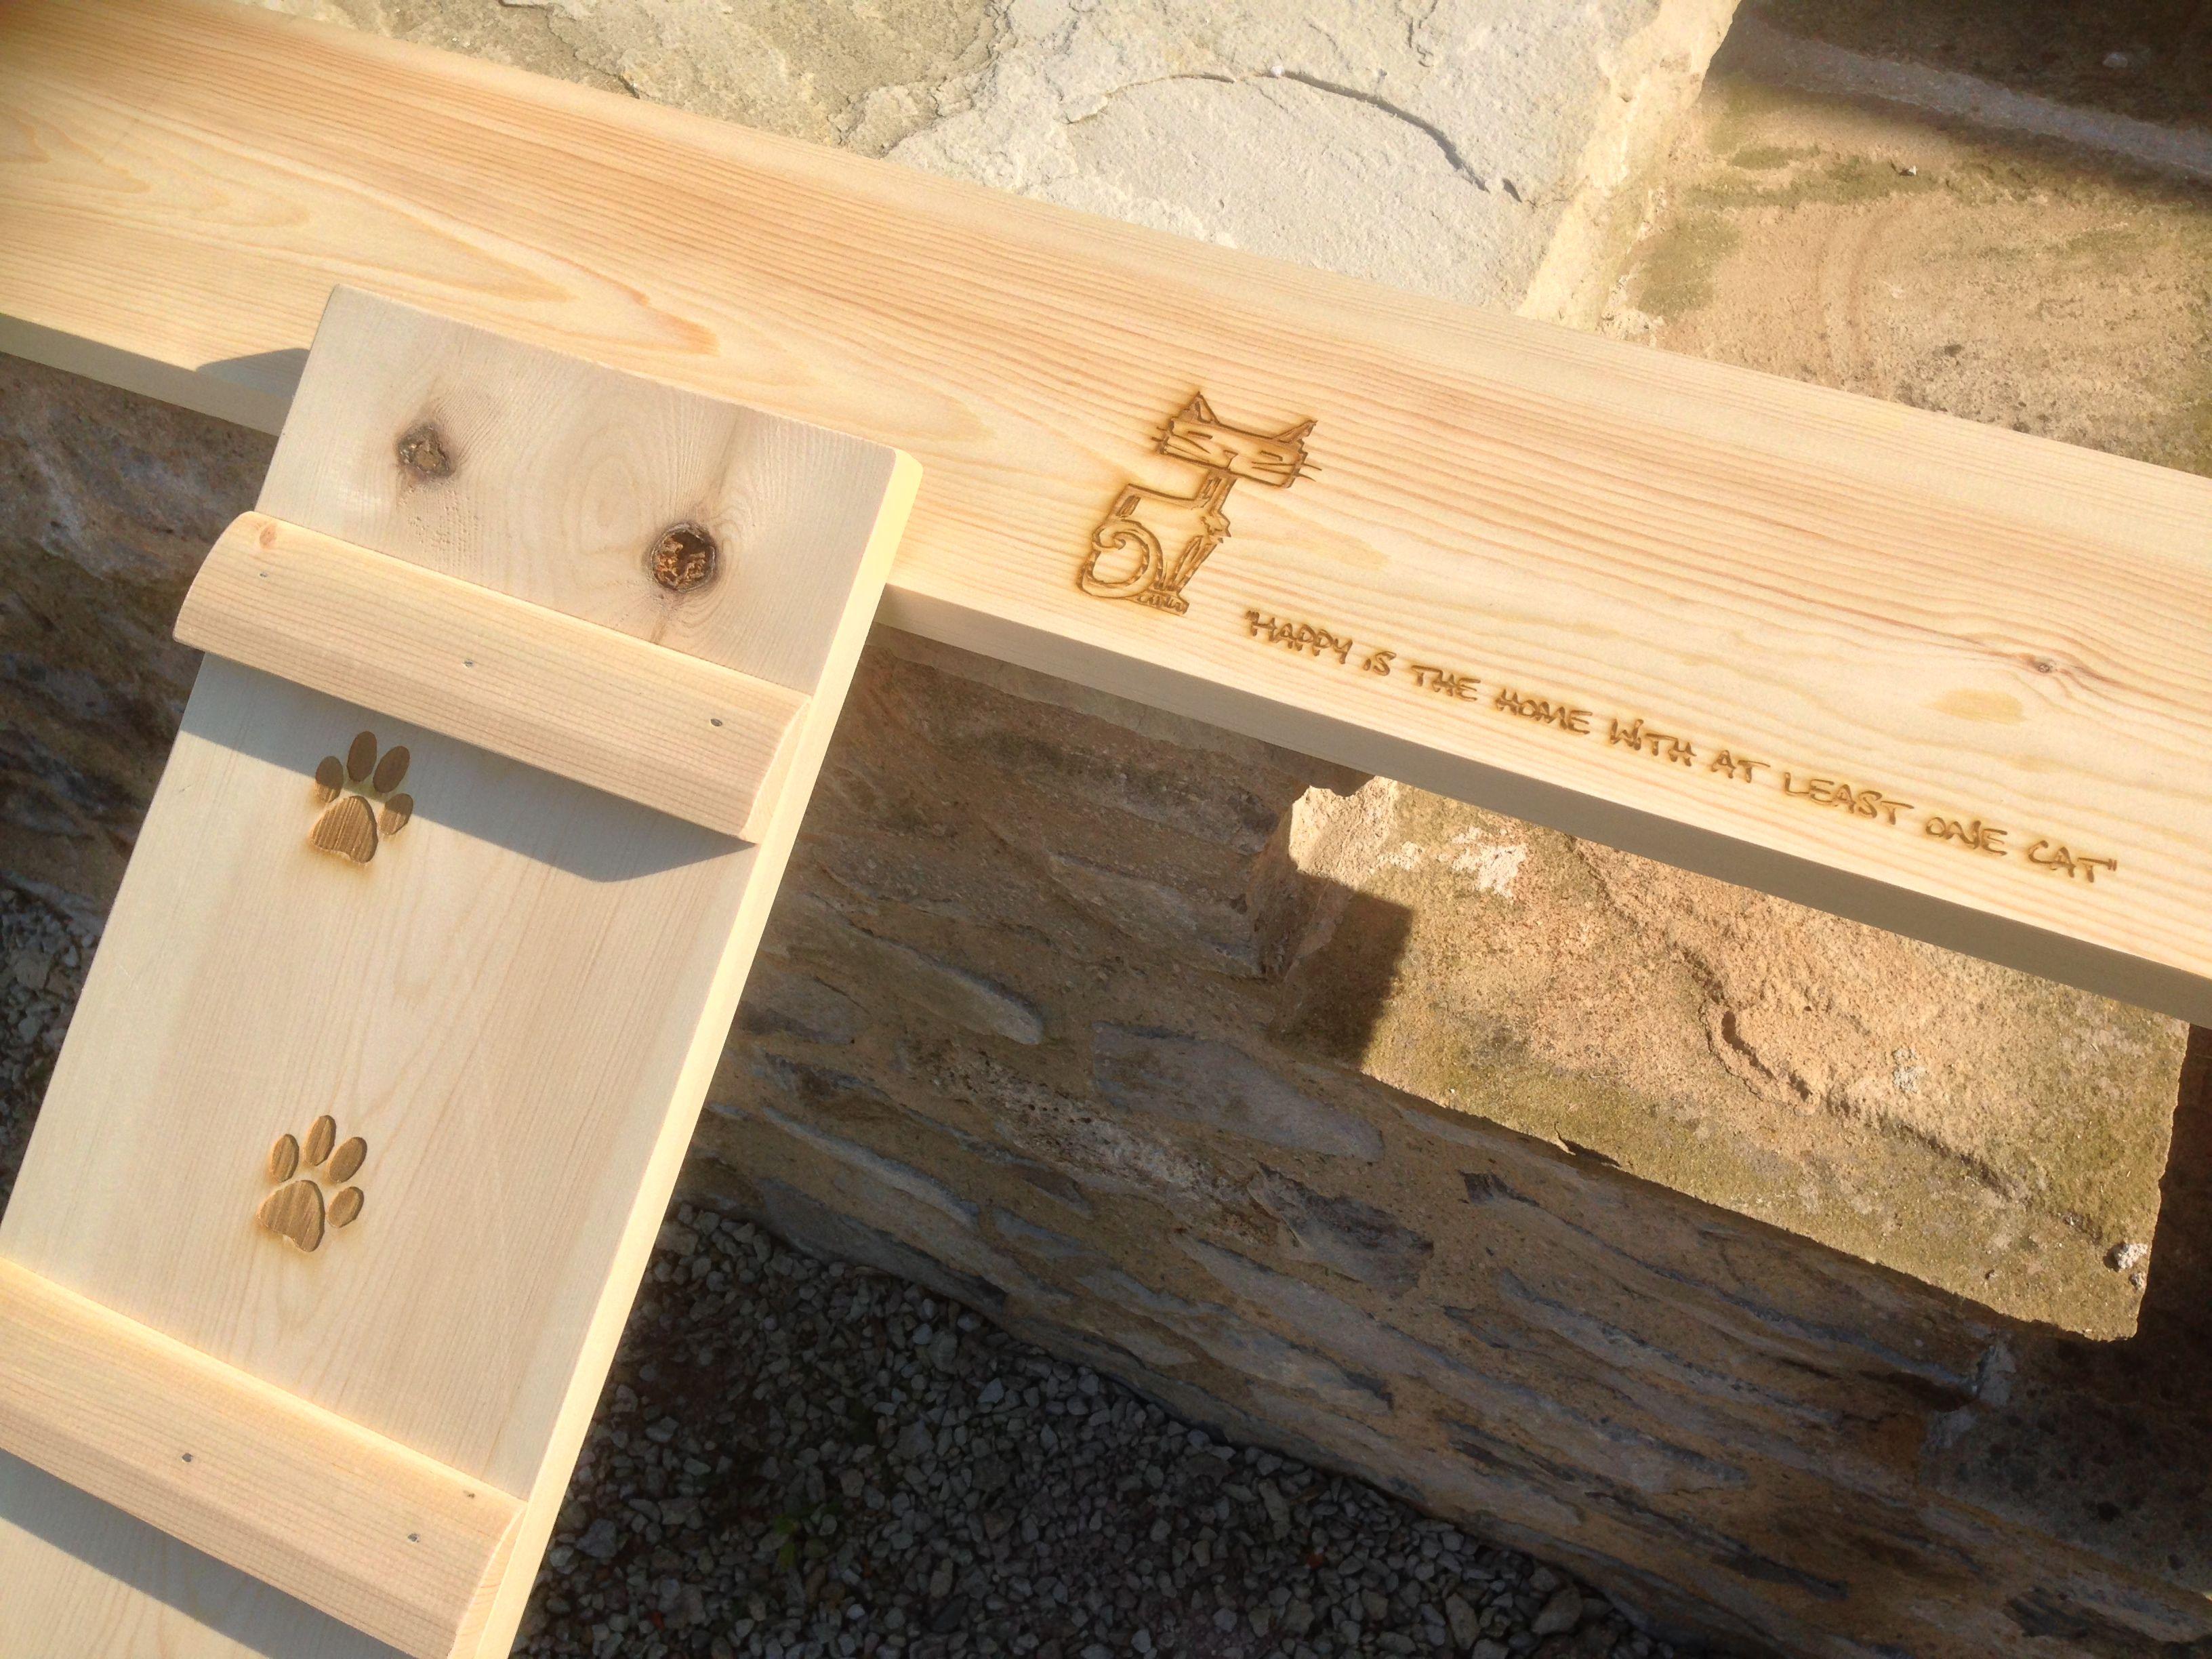 Laser engraved cat sleeping platform for Cat Rescue Centre